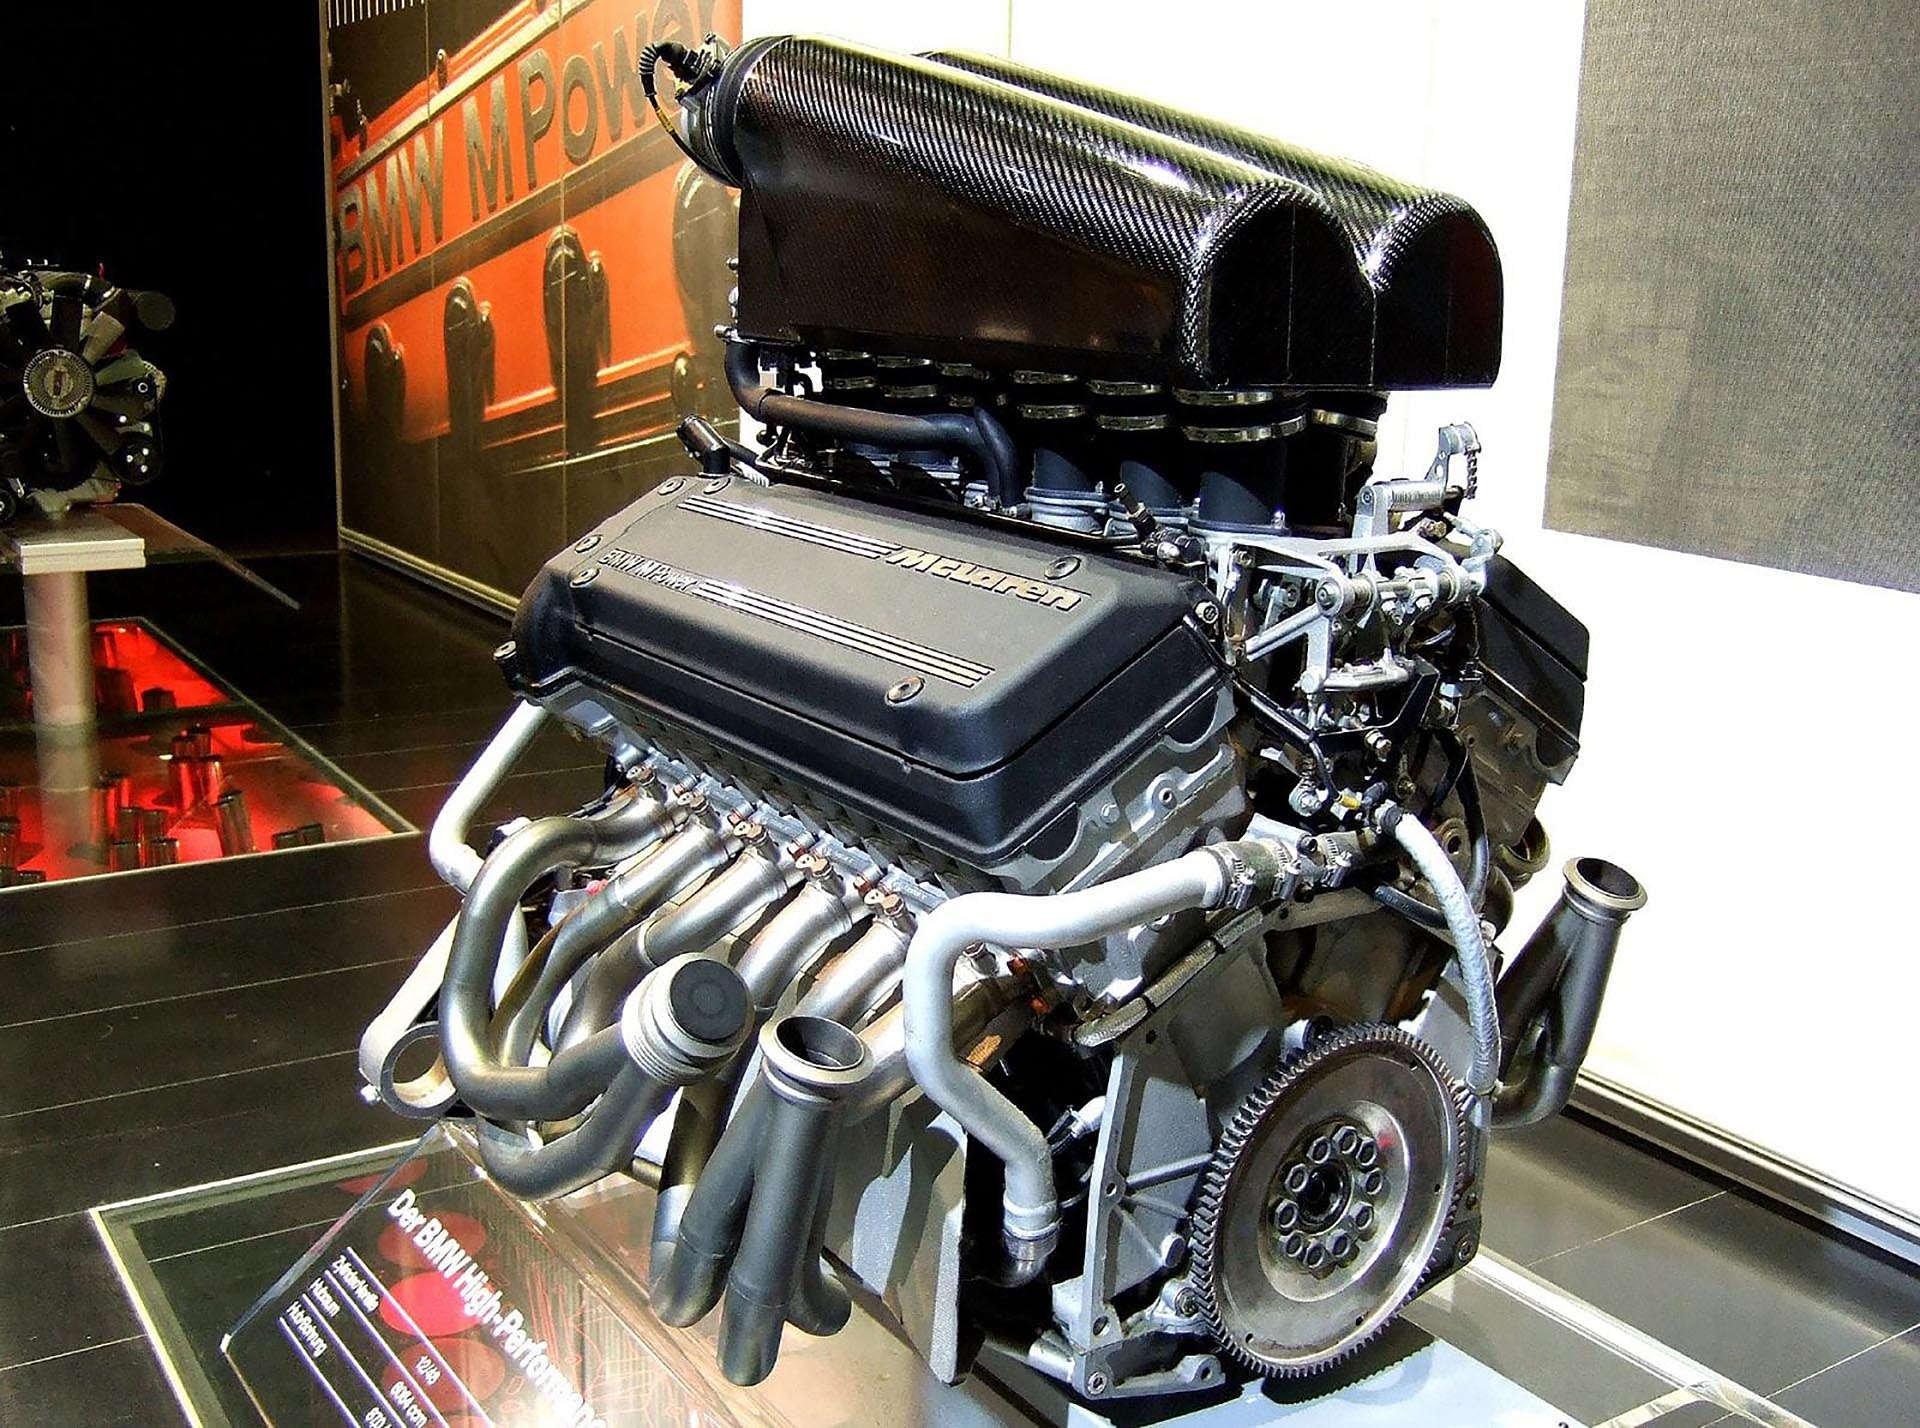 17-20_Mclaren-f1-1996-engine-v12-s70-02